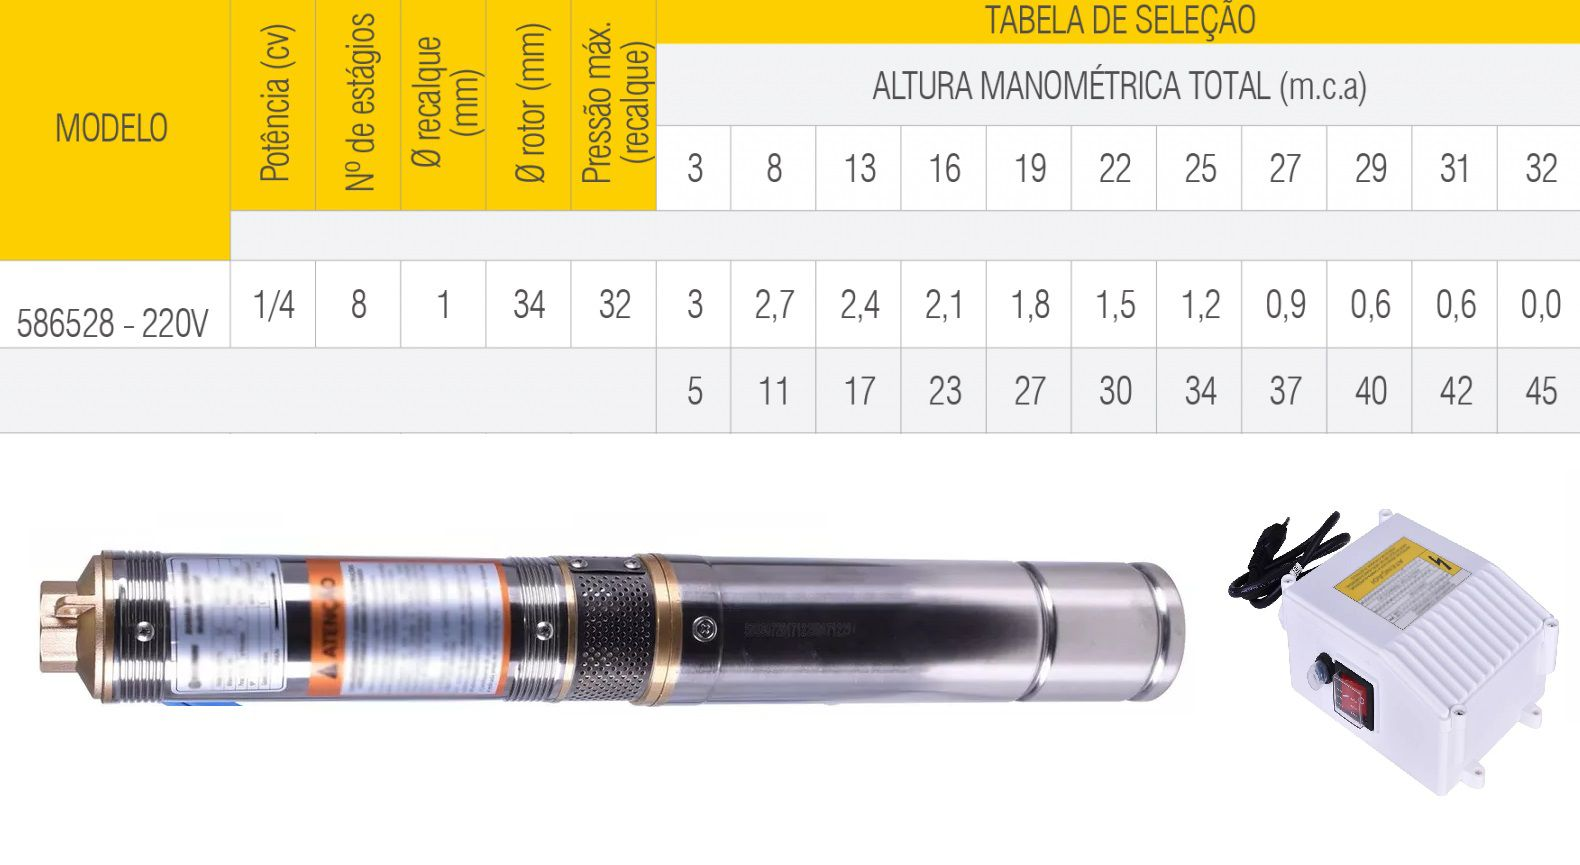 "Motobomba Multiestágio Submersa Tipo Caneta 2,5"" 1/4hp 220v- Matsuyama"